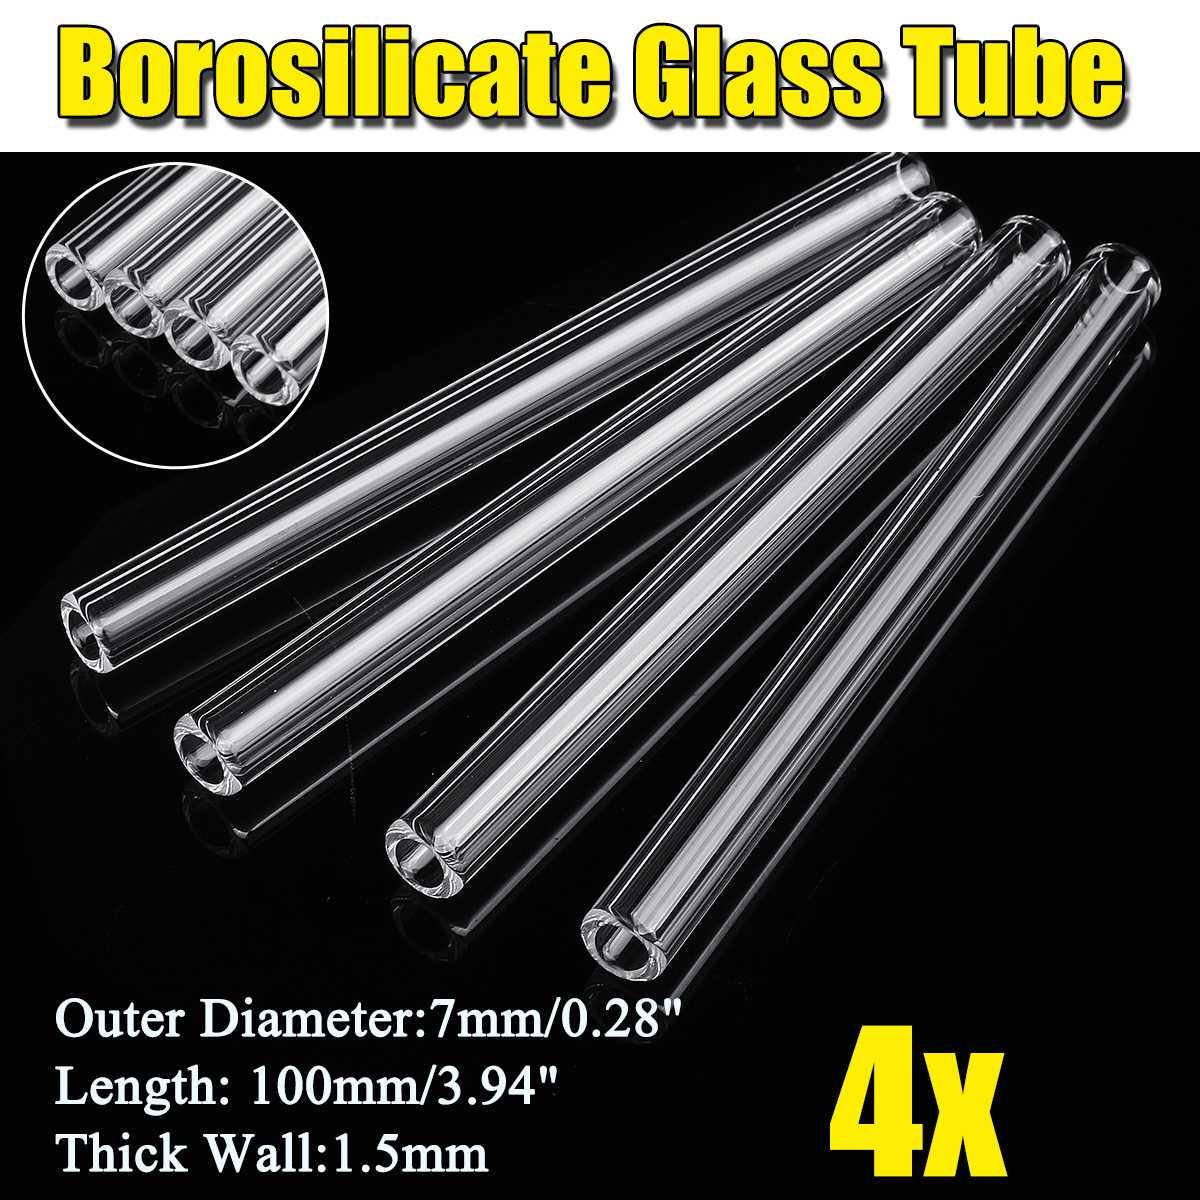 KICUTE Glass Blowing Tube 4Pcs 100mm OD 7mm 1.5mm Thick Wall Borosilicate Lab Tubing School Factory Laboratory